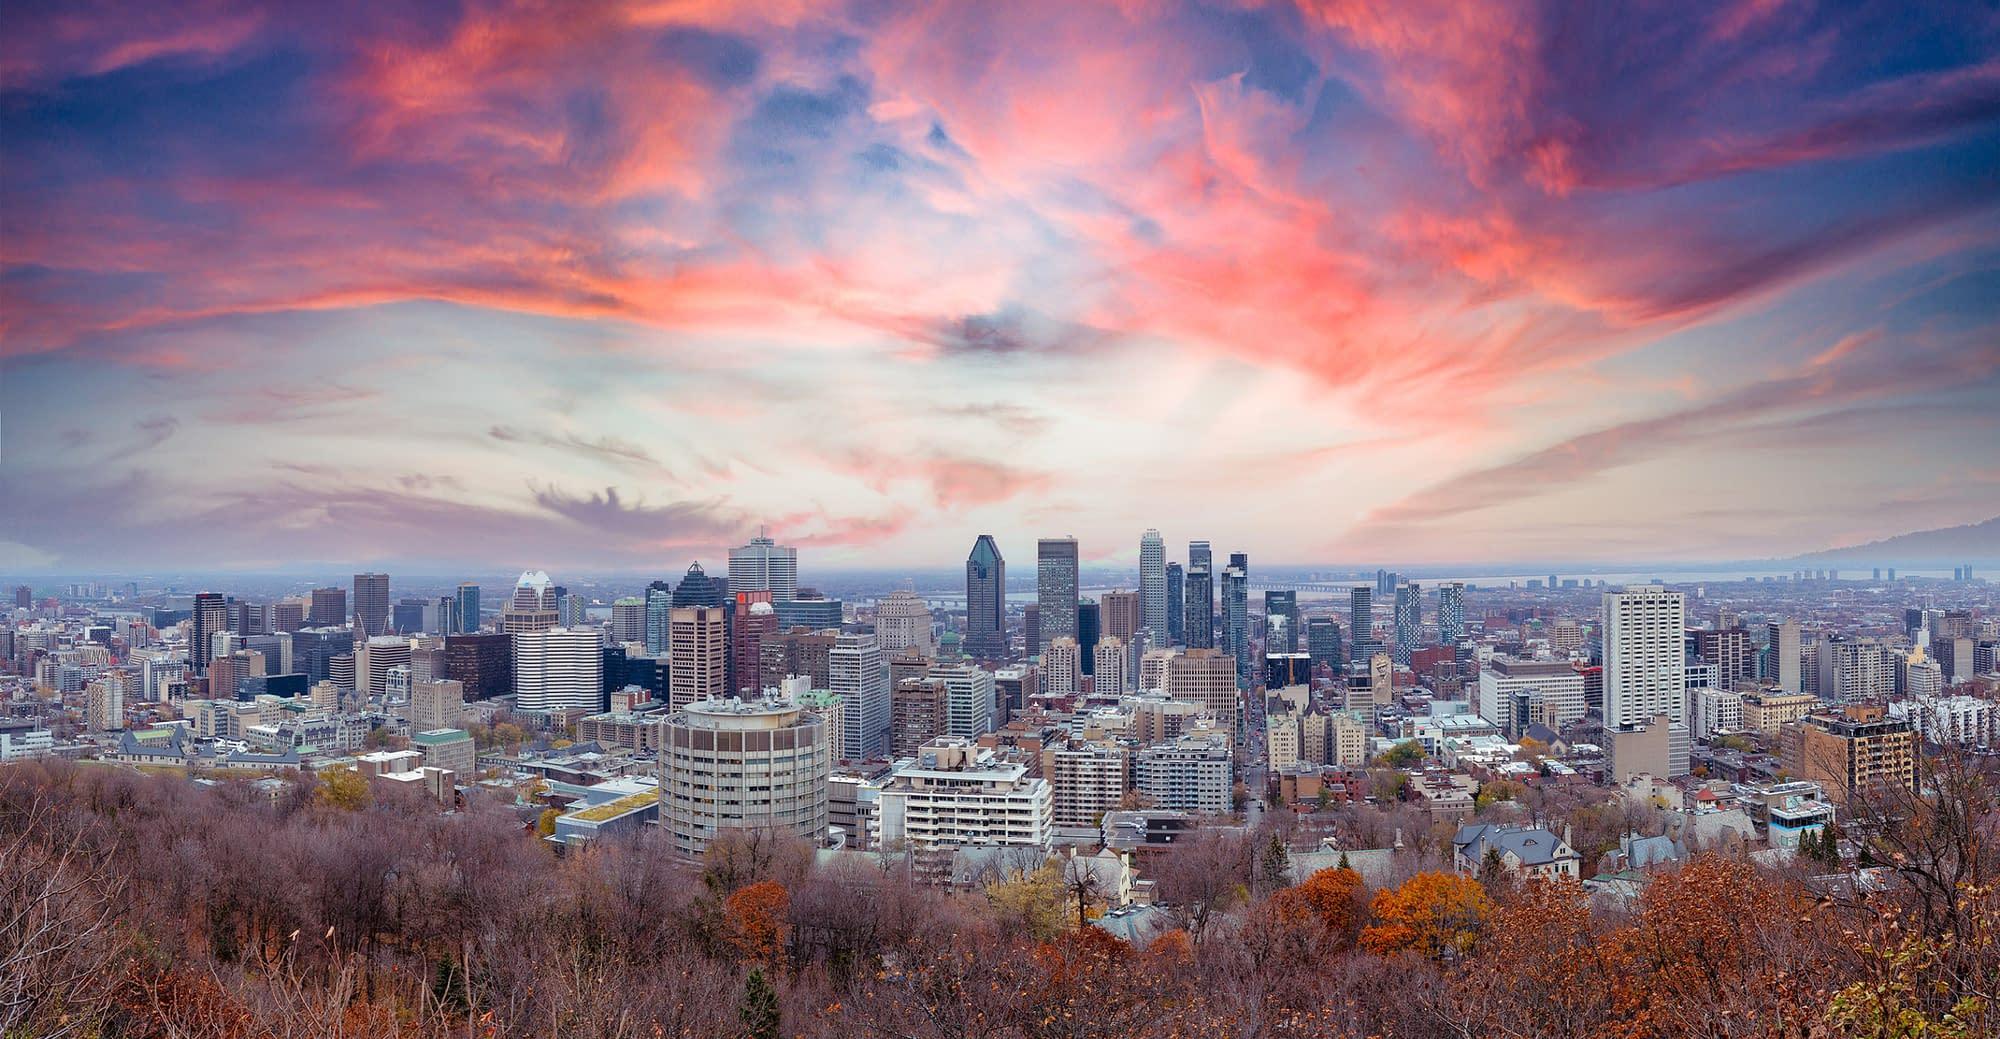 Montreal City Headshots Photography